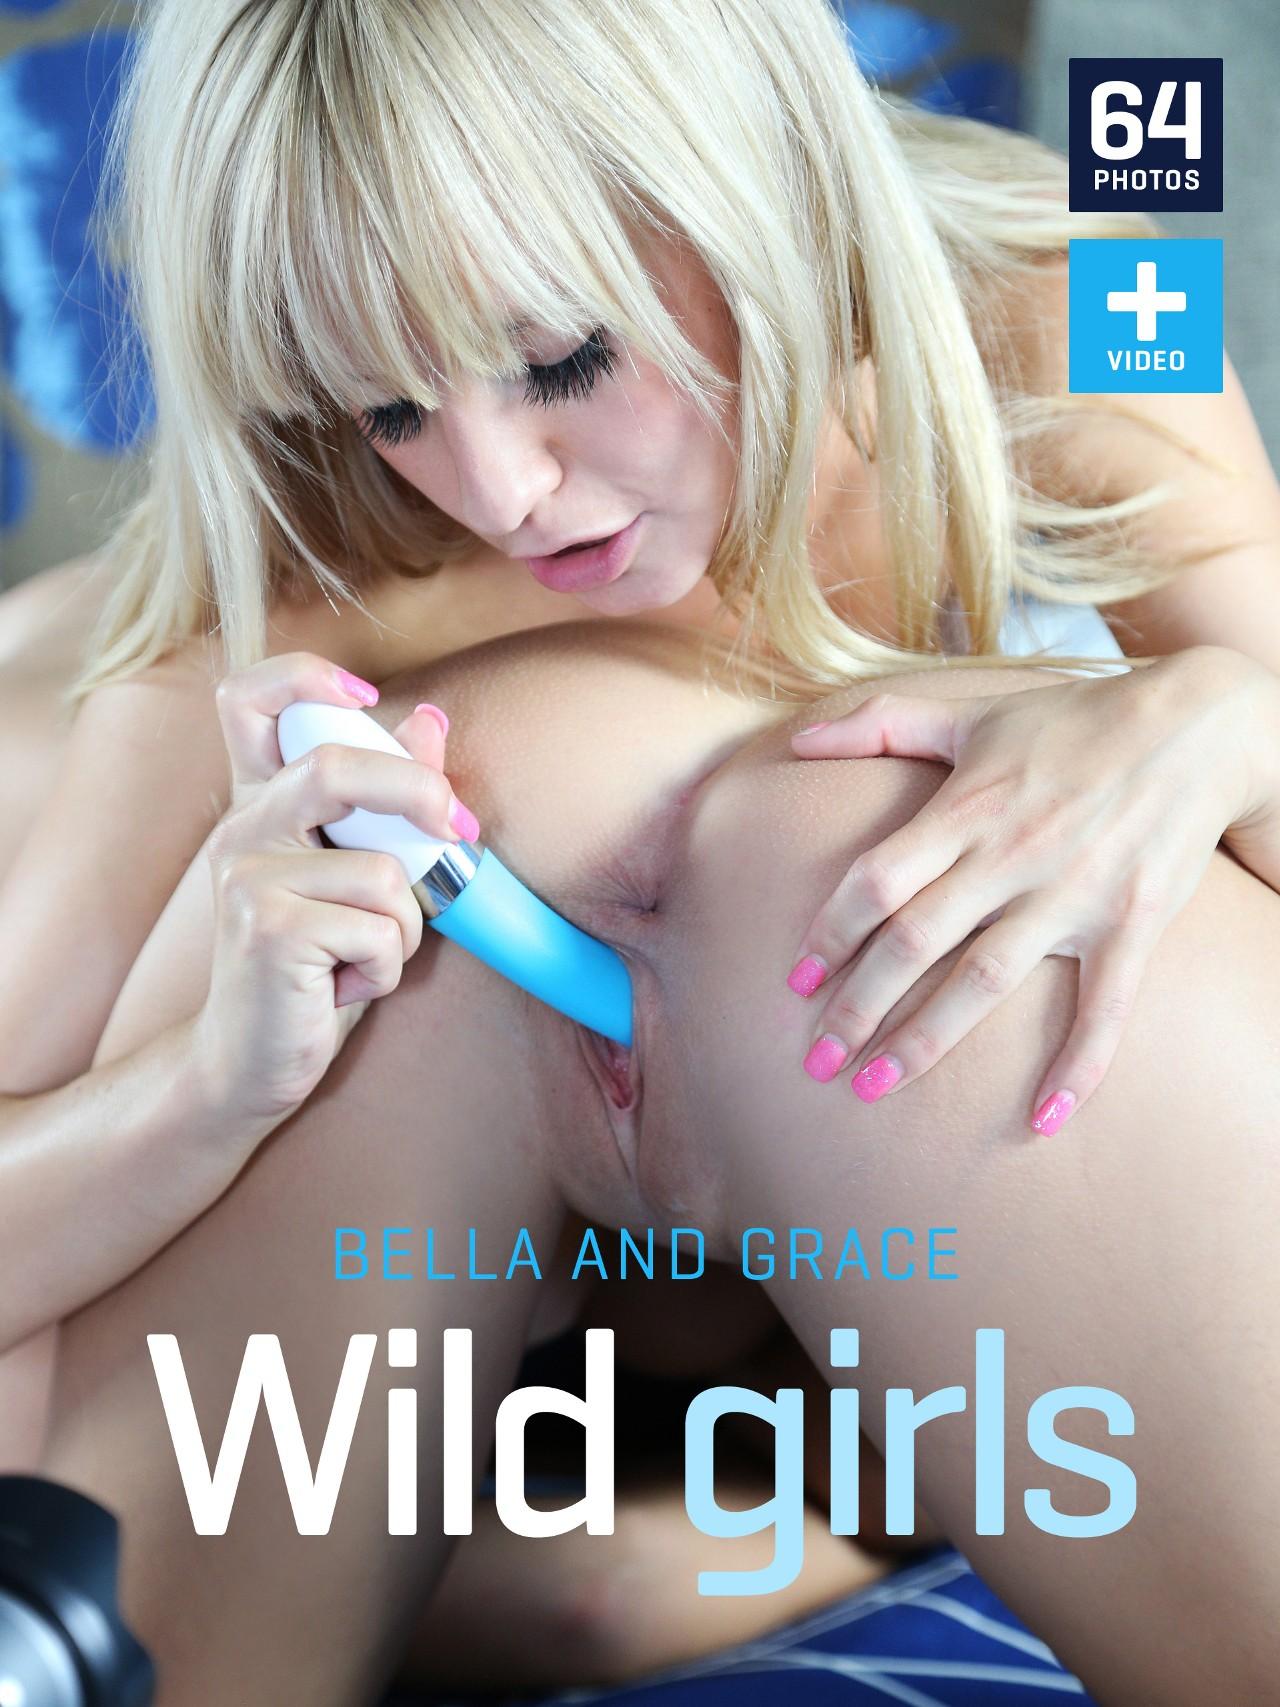 Bella Babe, Grace: Wild girls